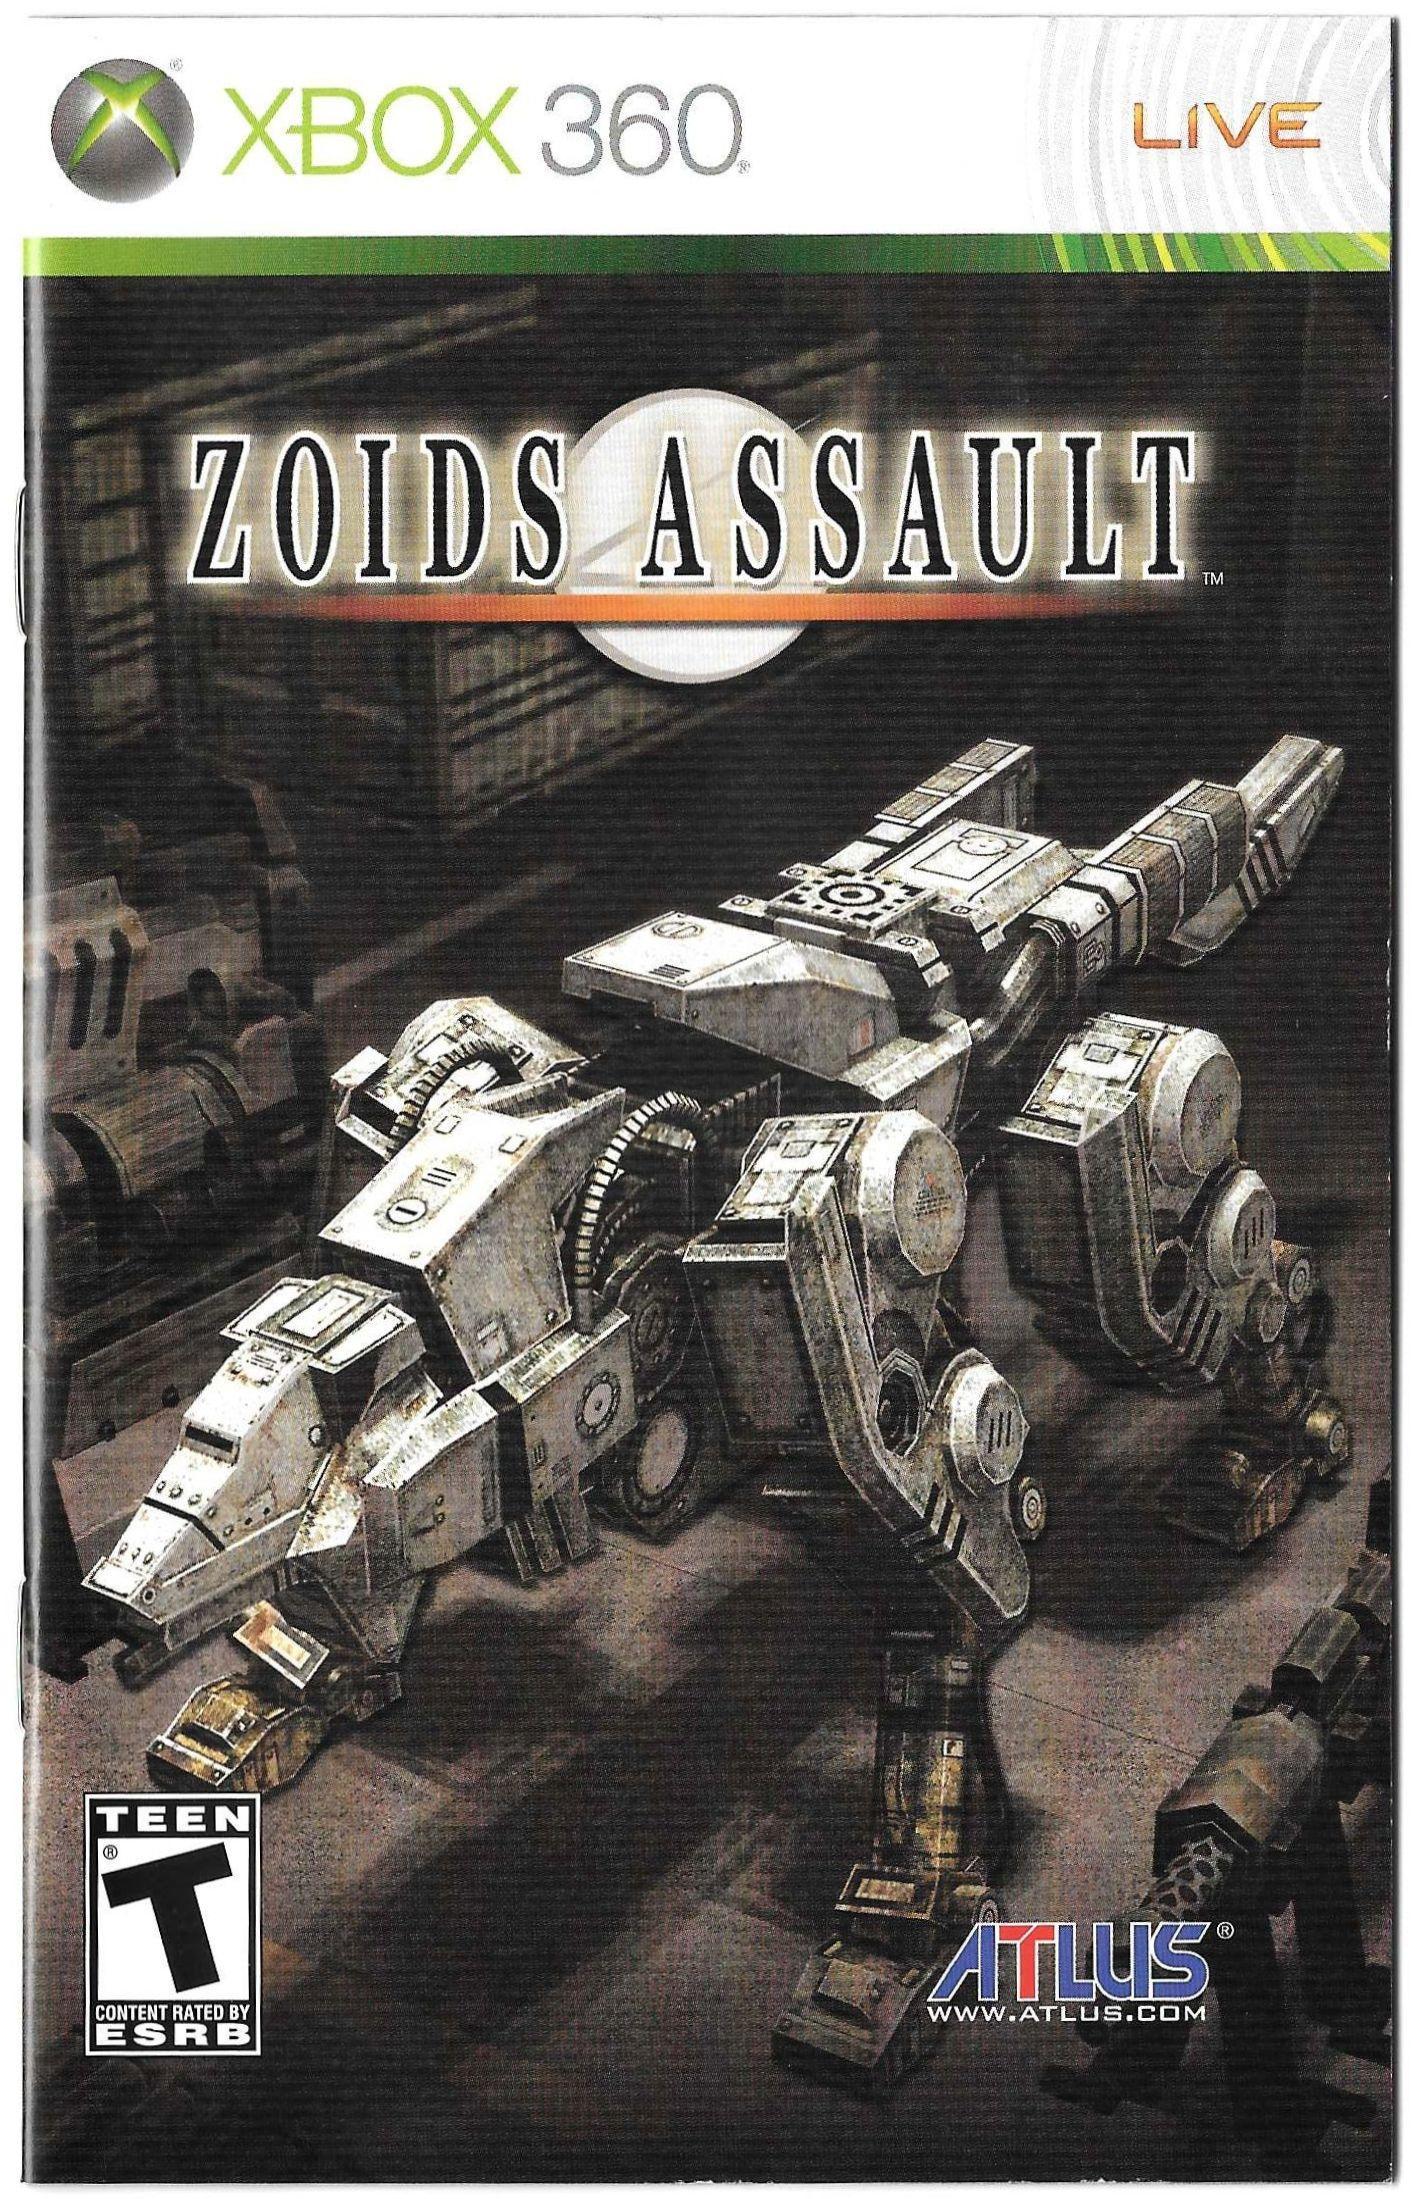 Zoids Assault manual (Xbox 360)